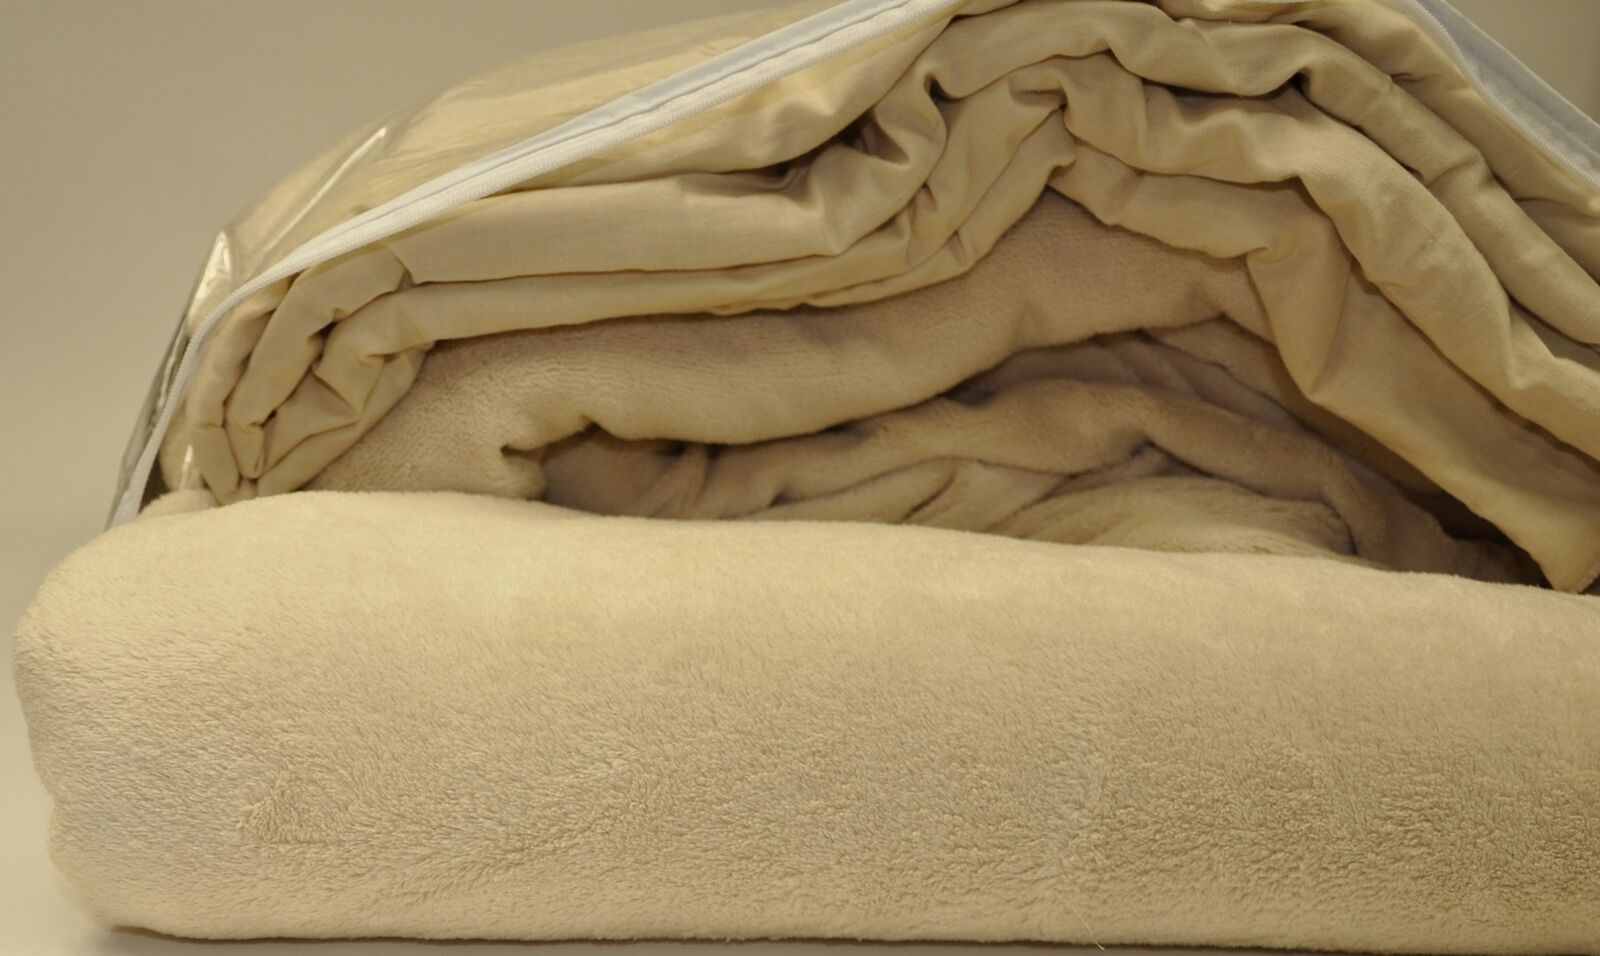 Microfiber Luxury Coral Fleece Bed Sheet Set (Full, Tan)